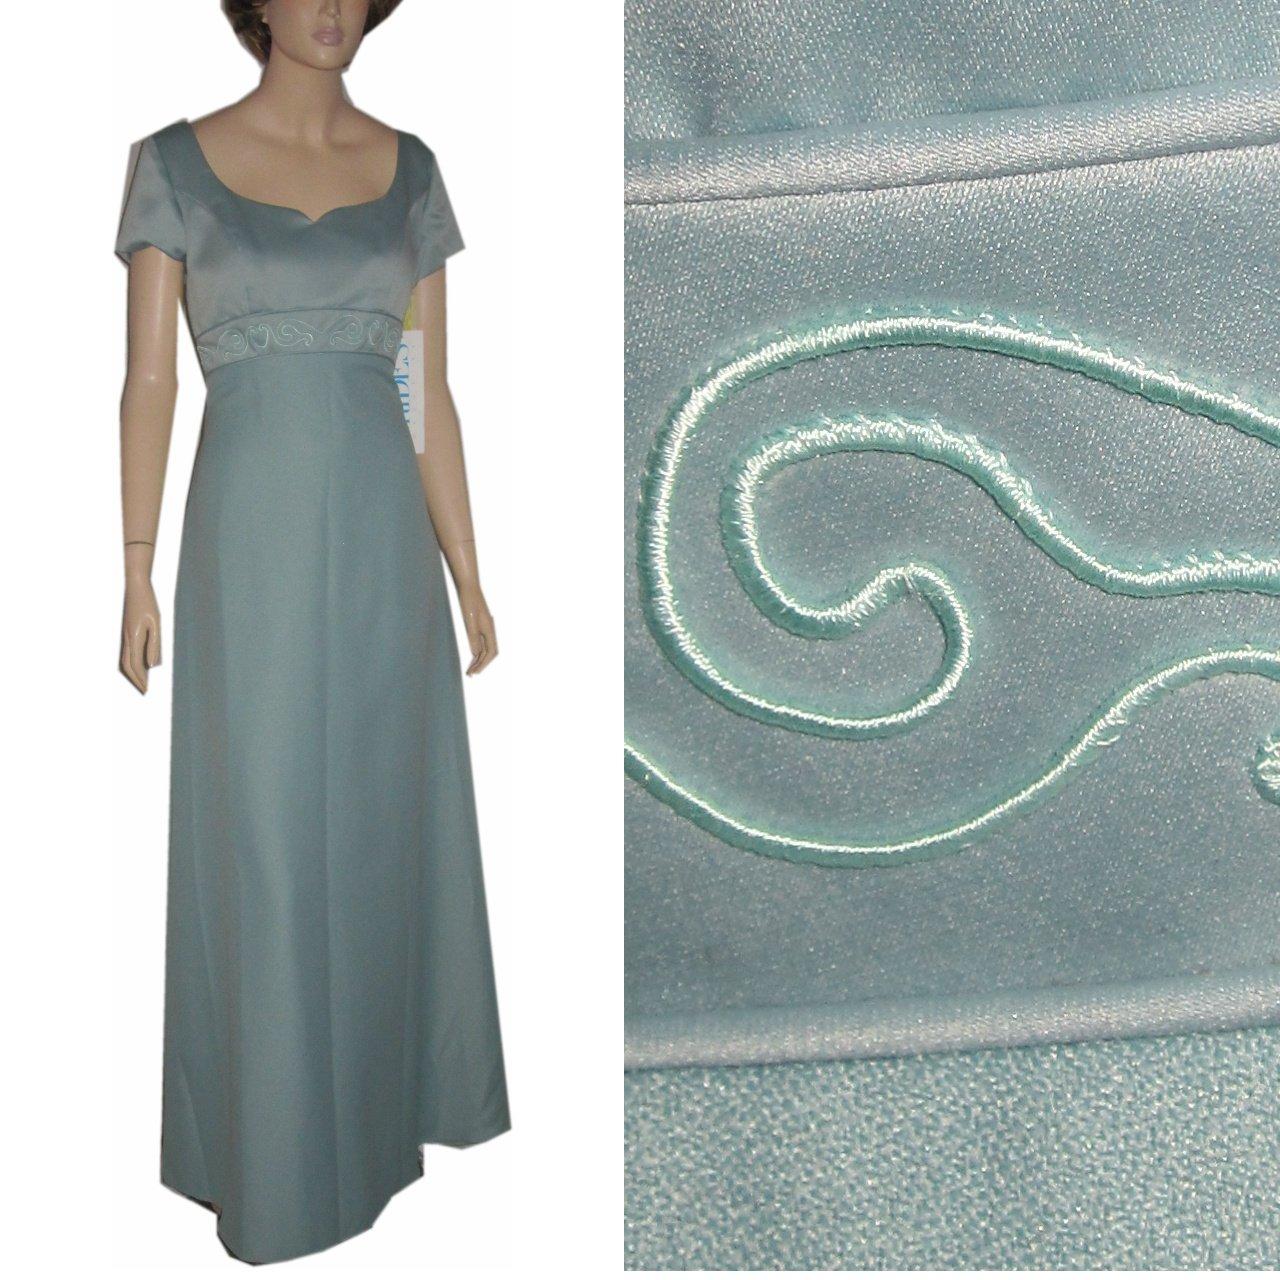 sz M - '70s JORDAN Empire Satin Gown UNWORN w/tags - Aquamarine